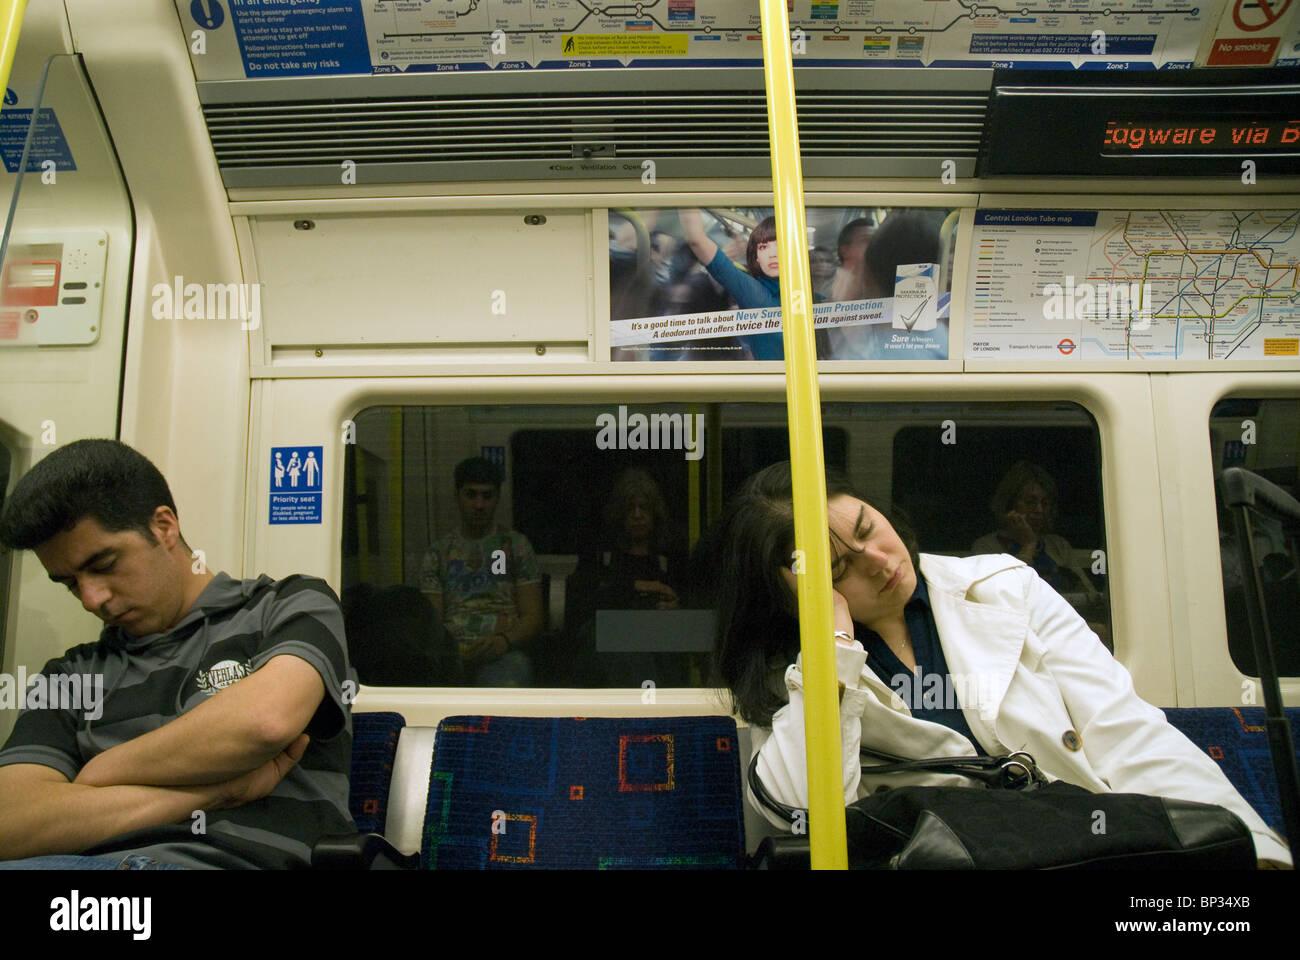 Falling asleep on the late night tube train - Stock Image